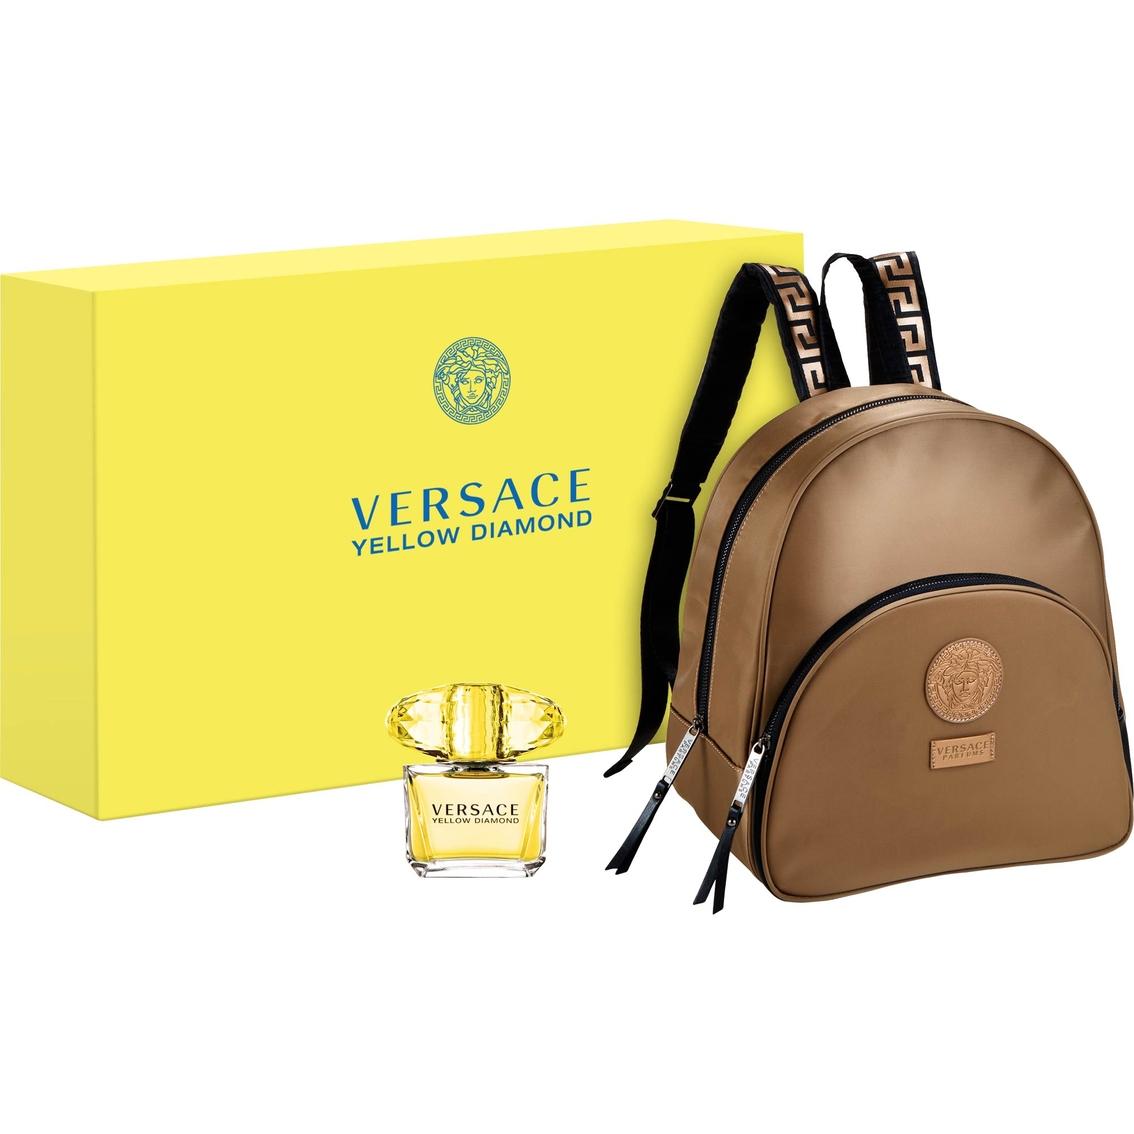 Versace Yellow Diamond Eau De Toilette And Backpack Gift Set  81d5b06cc9bc3